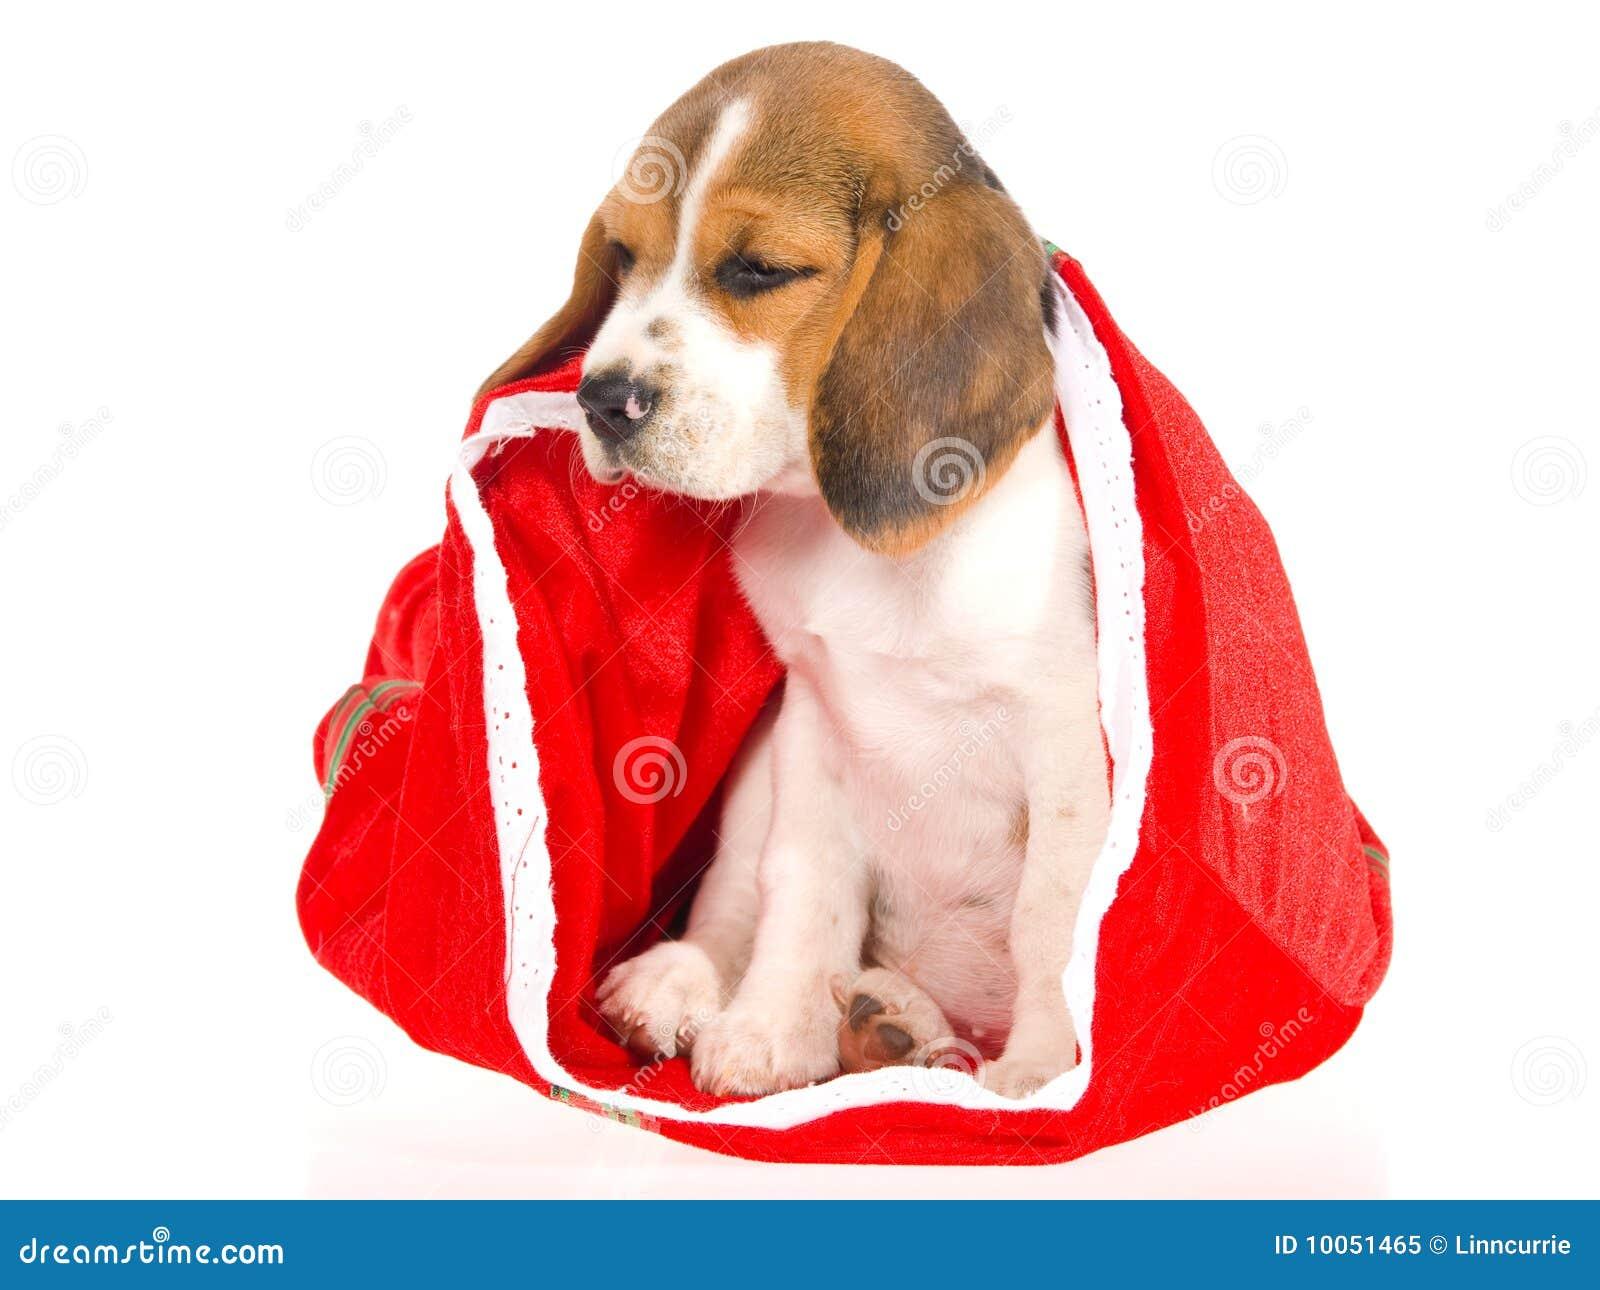 Beagle Puppy Sitting Inside Red Christmas Bag Stock Image Image Of Pedigreed Playful 10051465